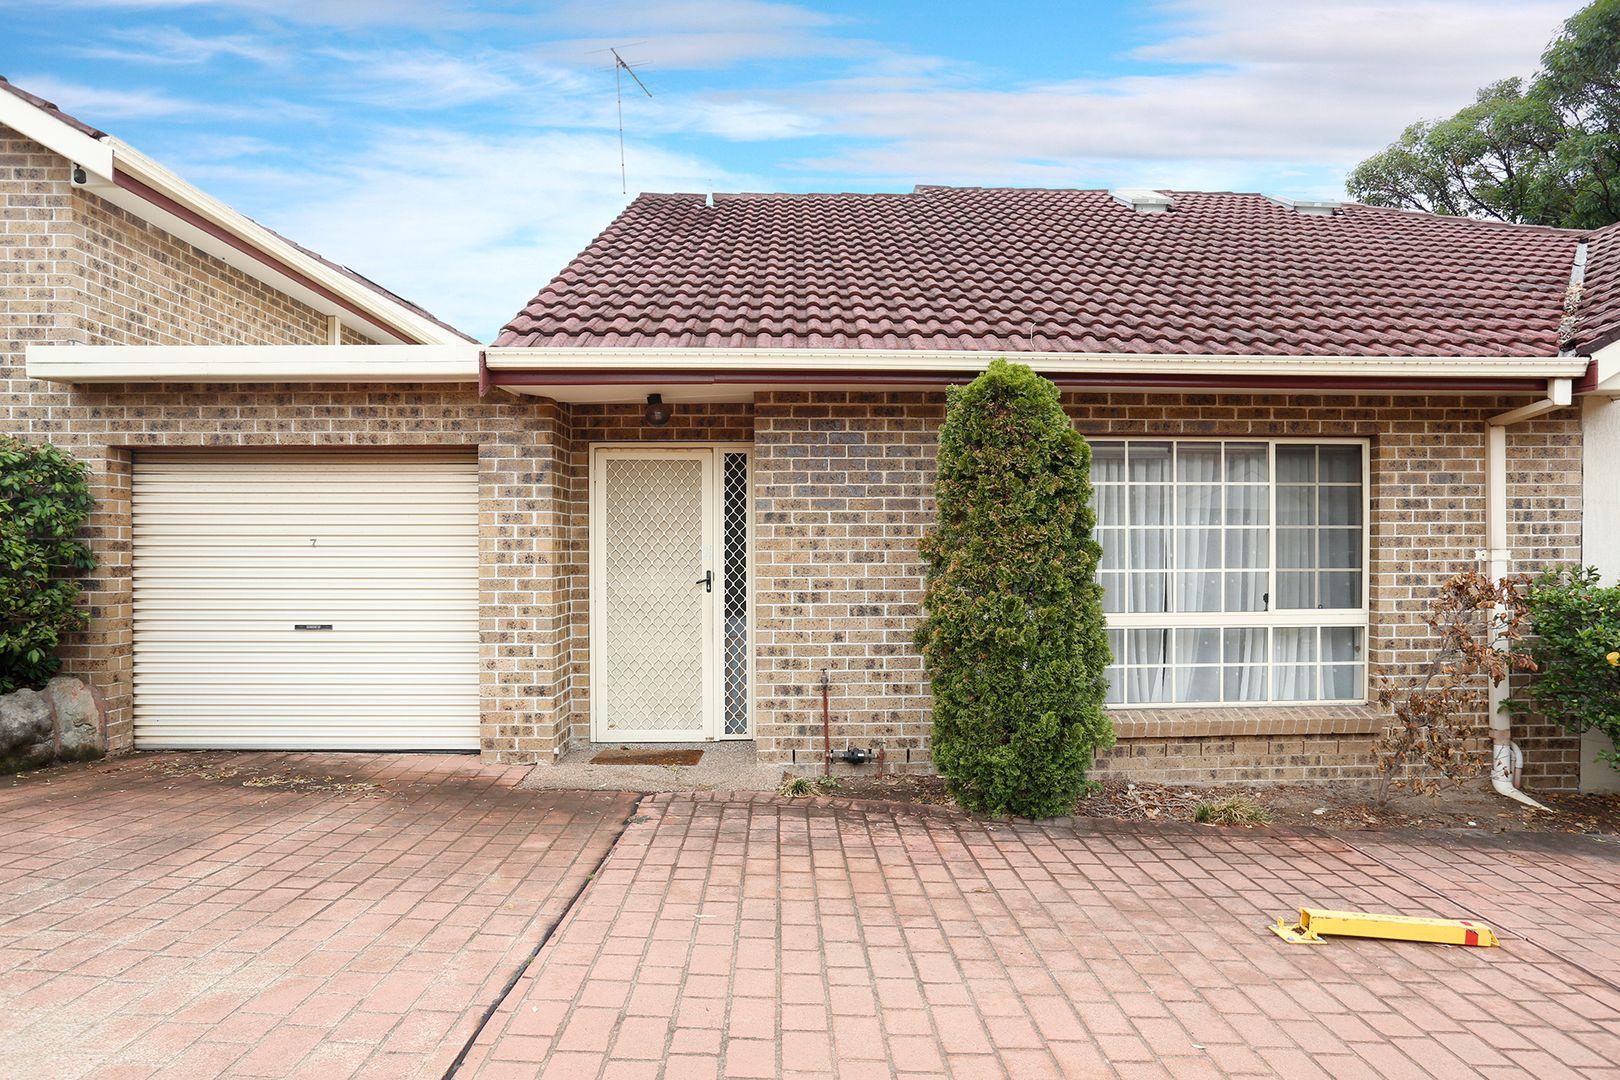 7/726-728 Victoria Road, Ermington NSW 2115, Image 0